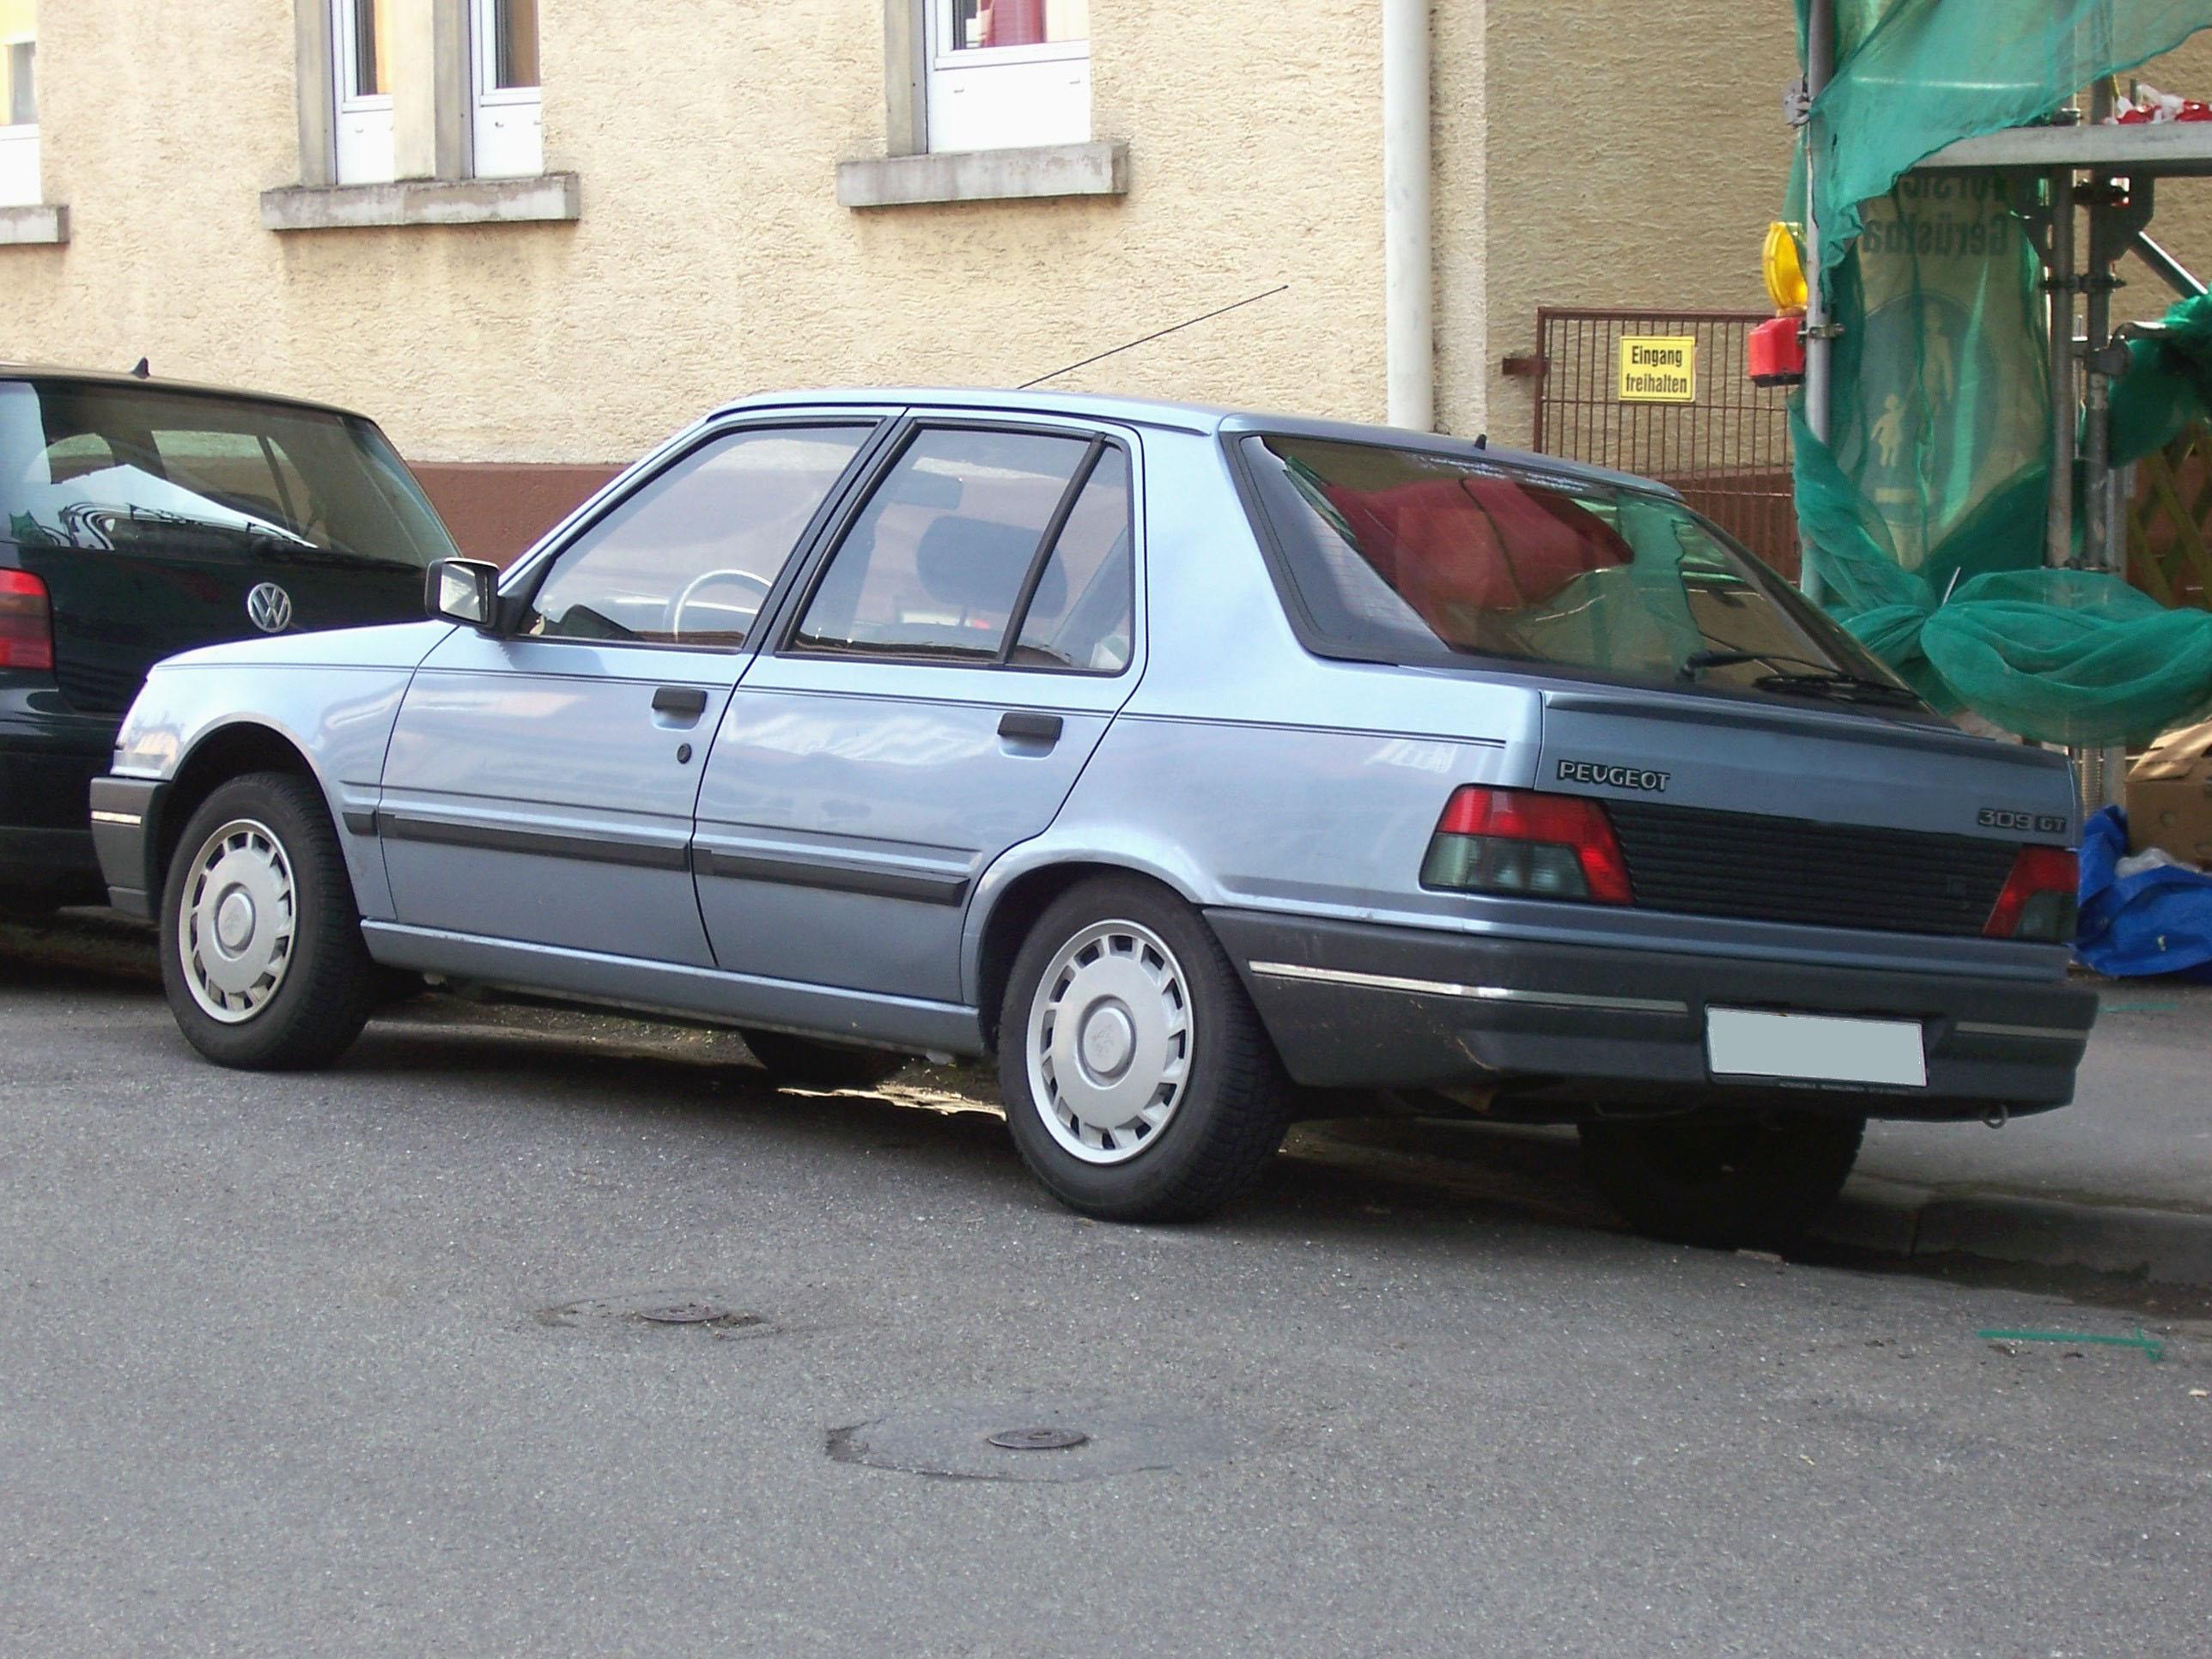 File:Peugeot 309 5T Serie 2 Heck.jpg